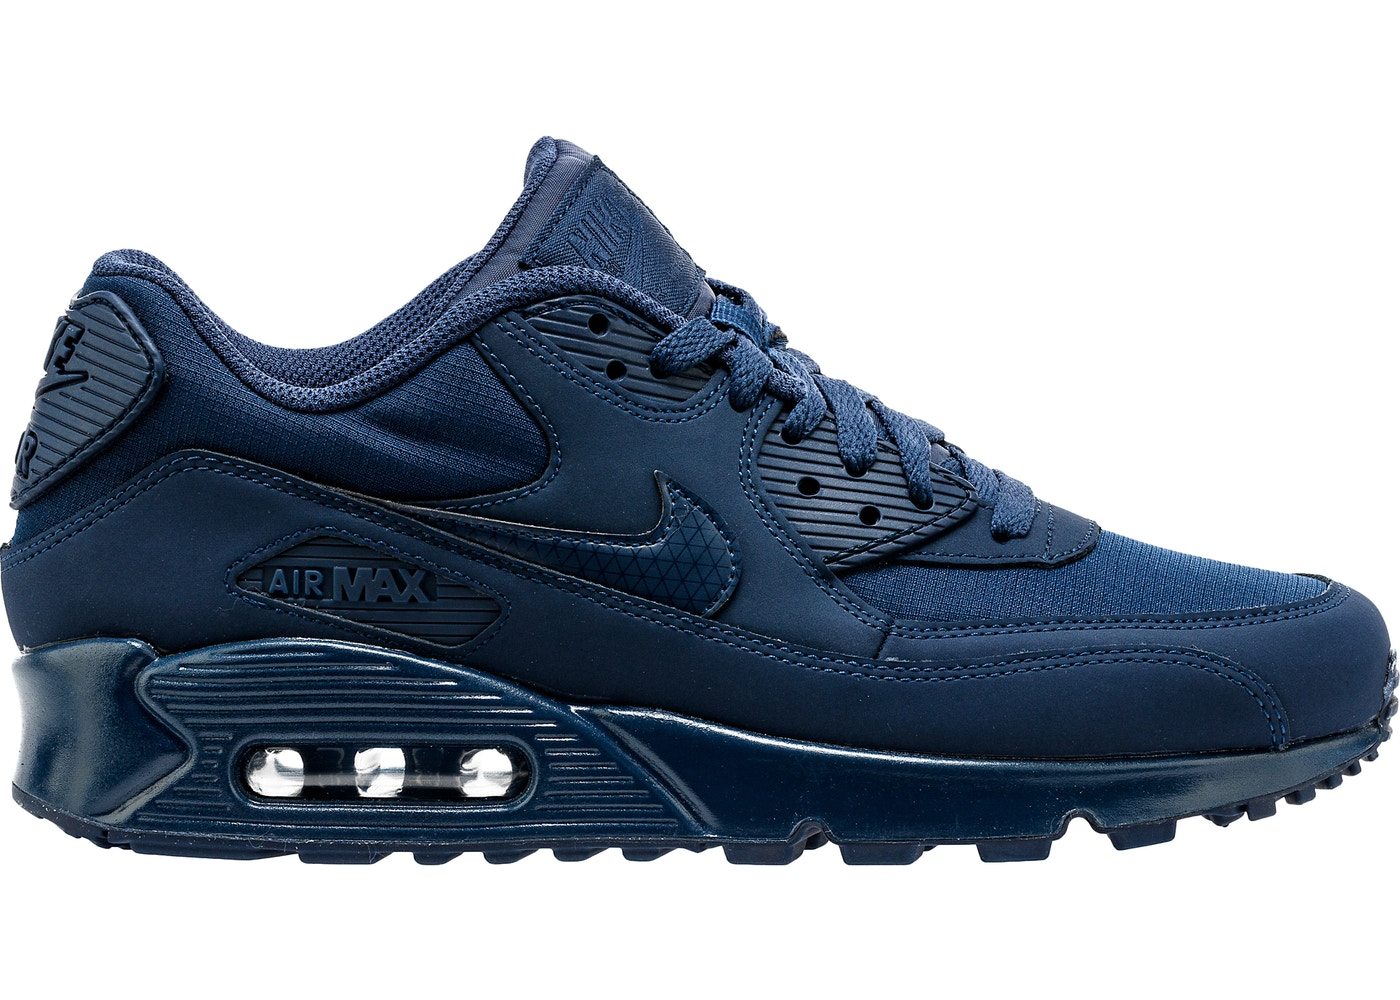 Nike Air Max 90 Midnight Navy (2016) - 537384-412